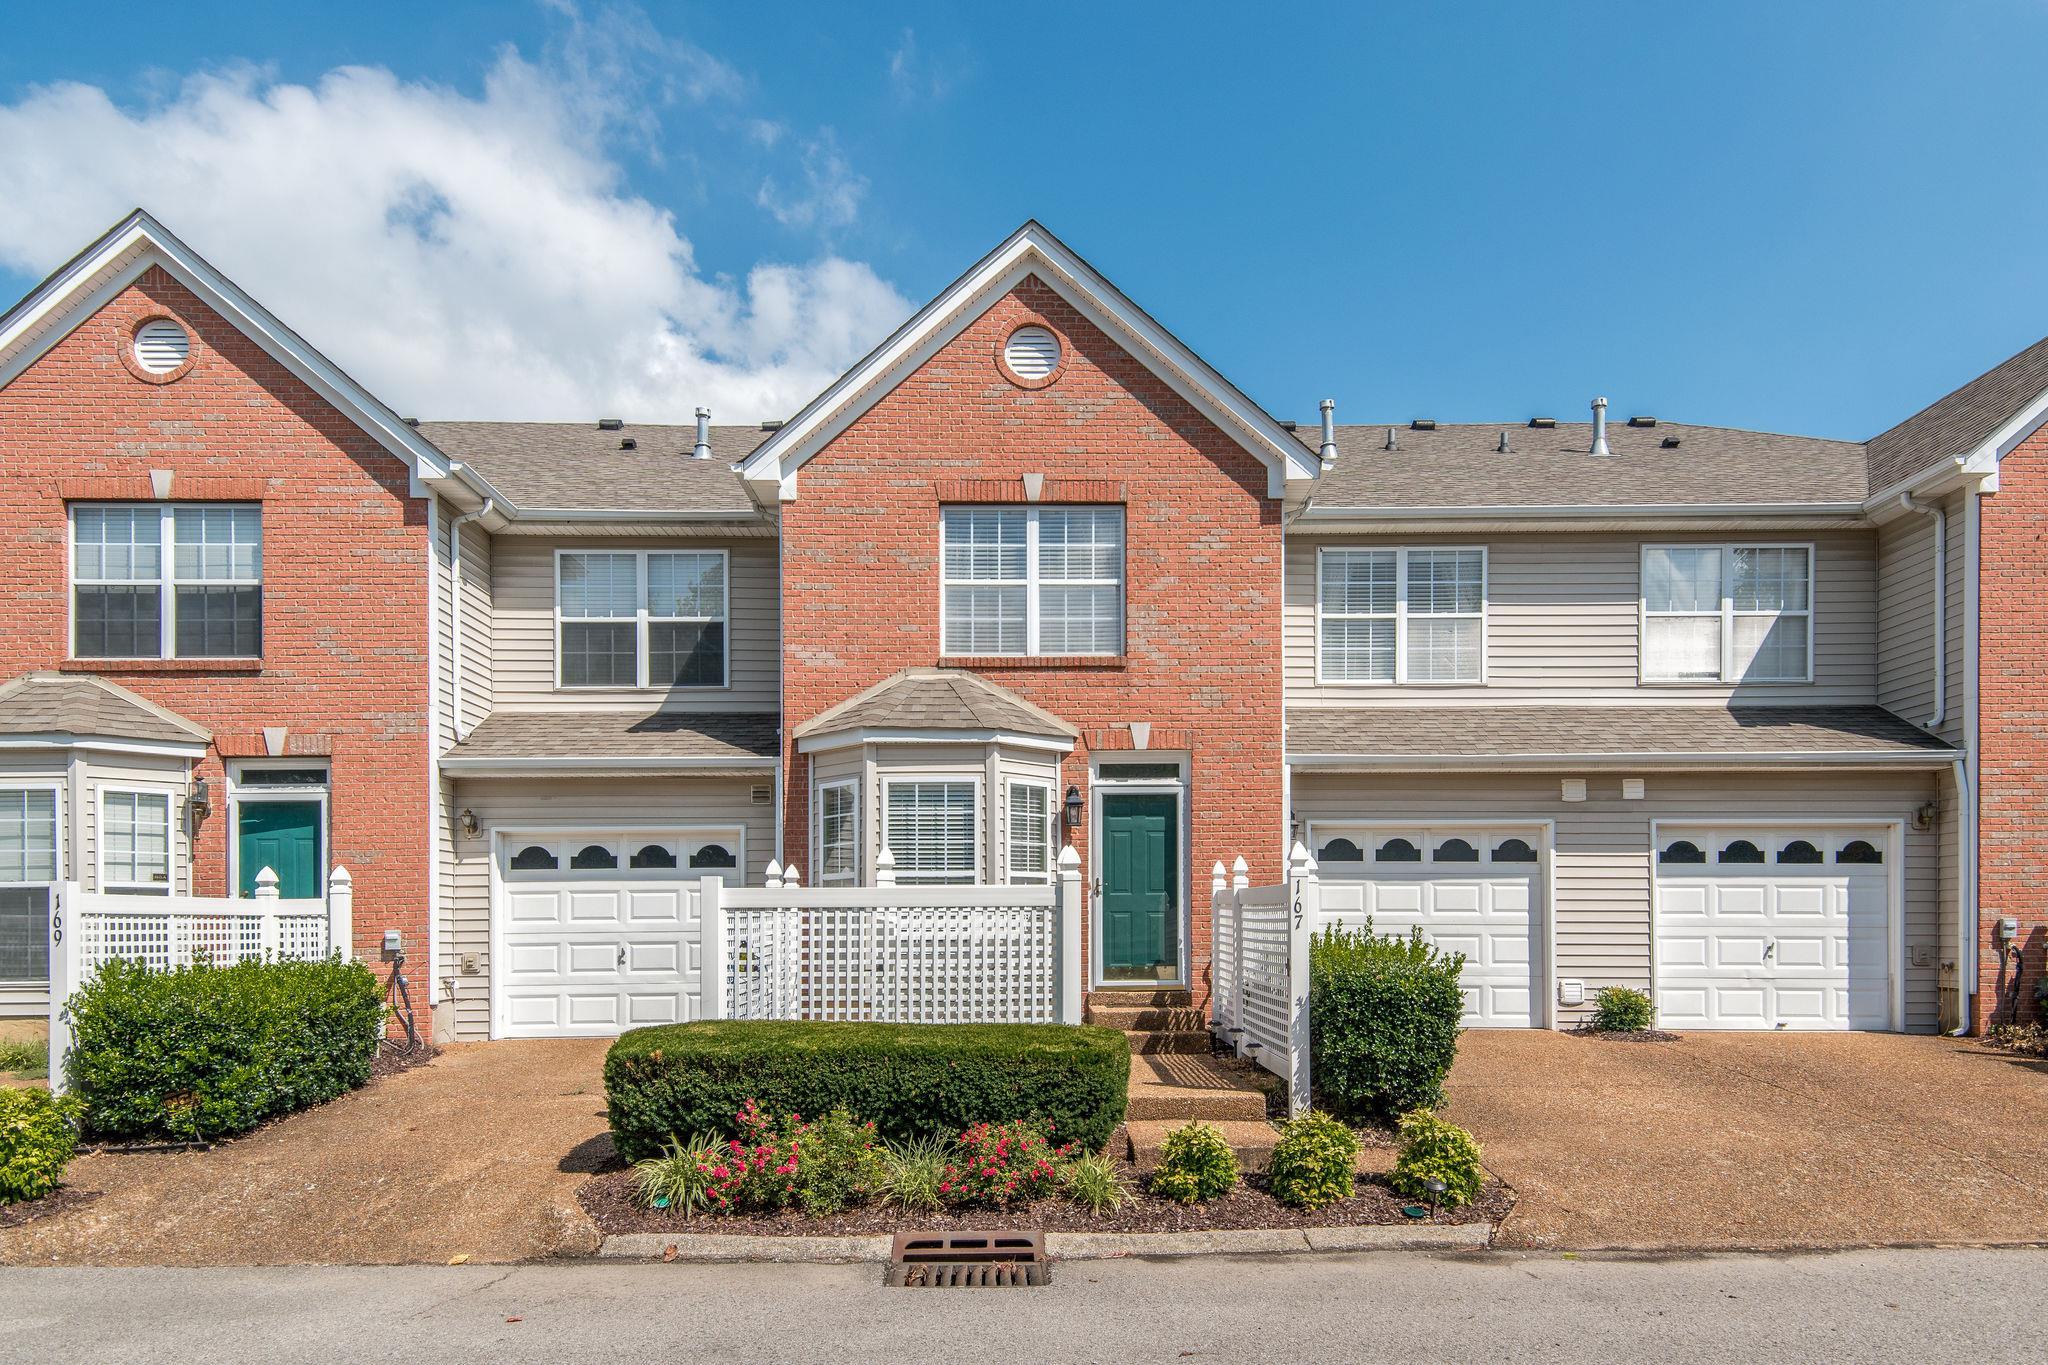 167 Stanton Hall Ln, Franklin, TN 37069 - Franklin, TN real estate listing